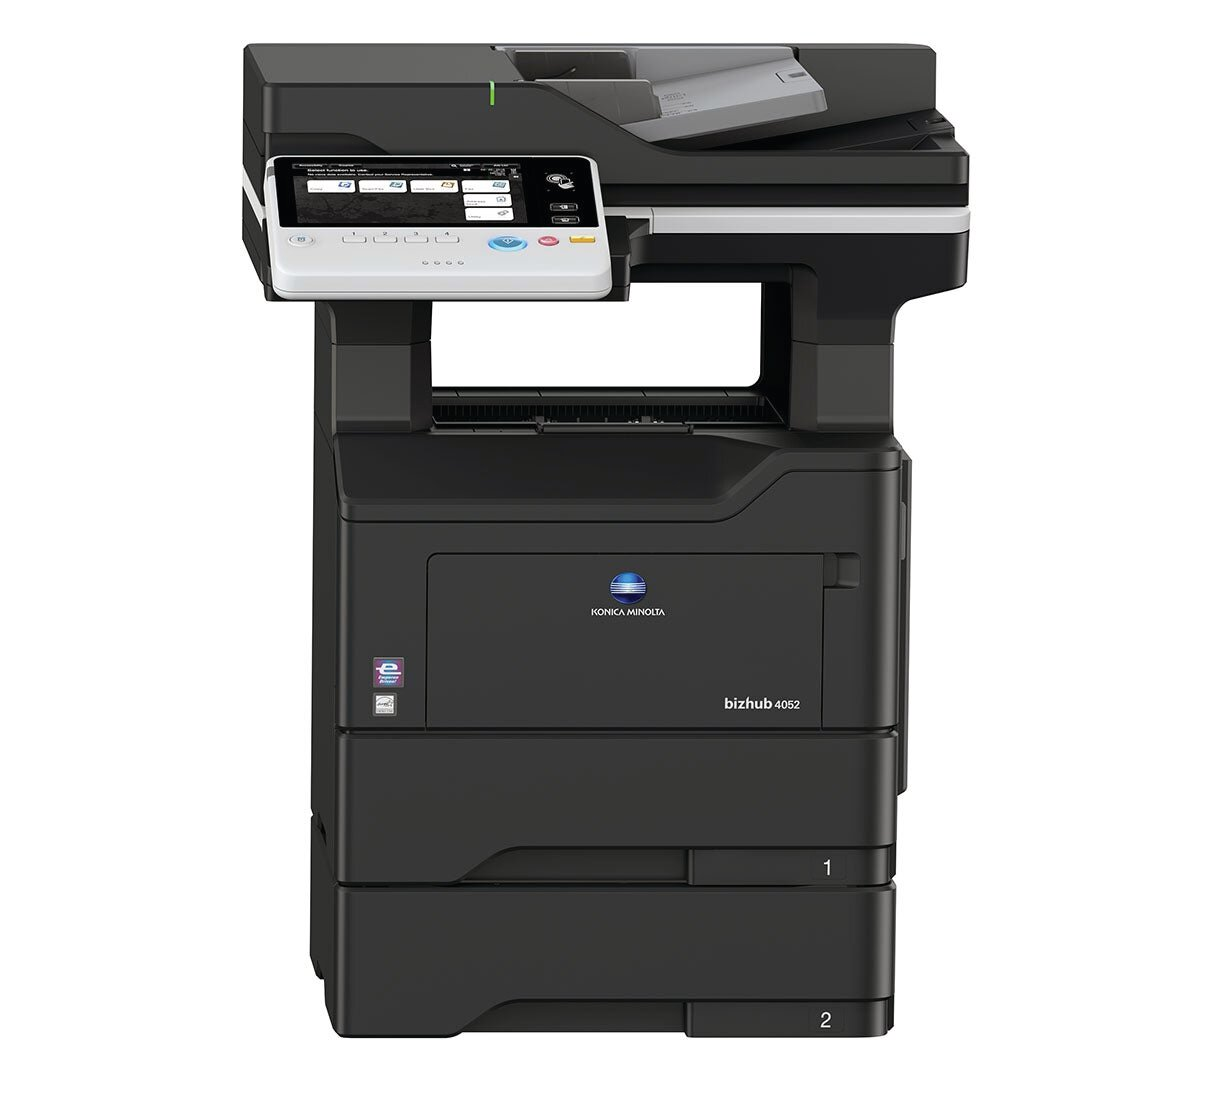 Konica Minolta bizhub 4052 office printer